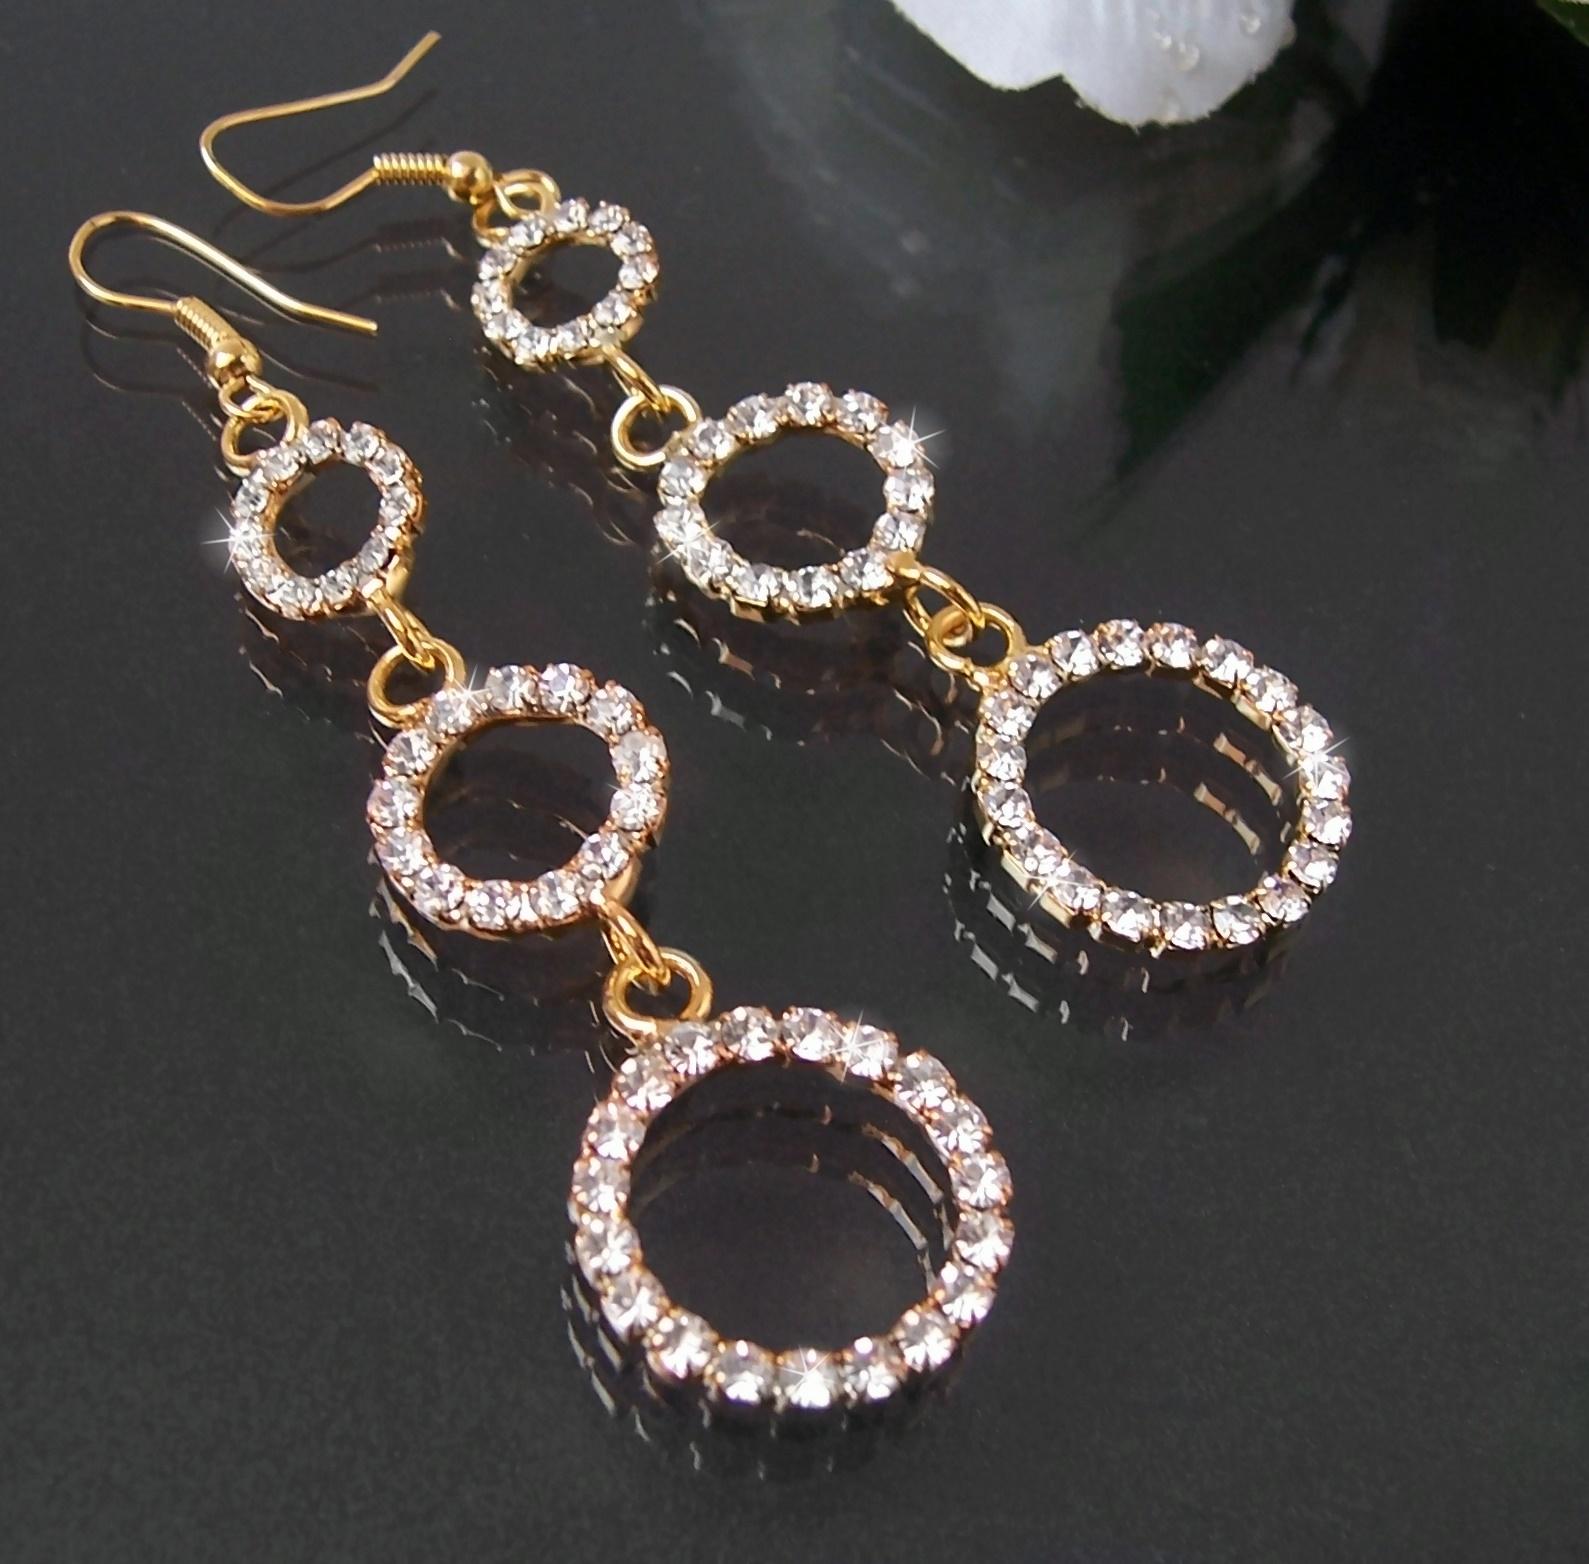 Ohrringe vergoldet Ohrhänger 8cm Strass Creolen Damen Schmuck O1775